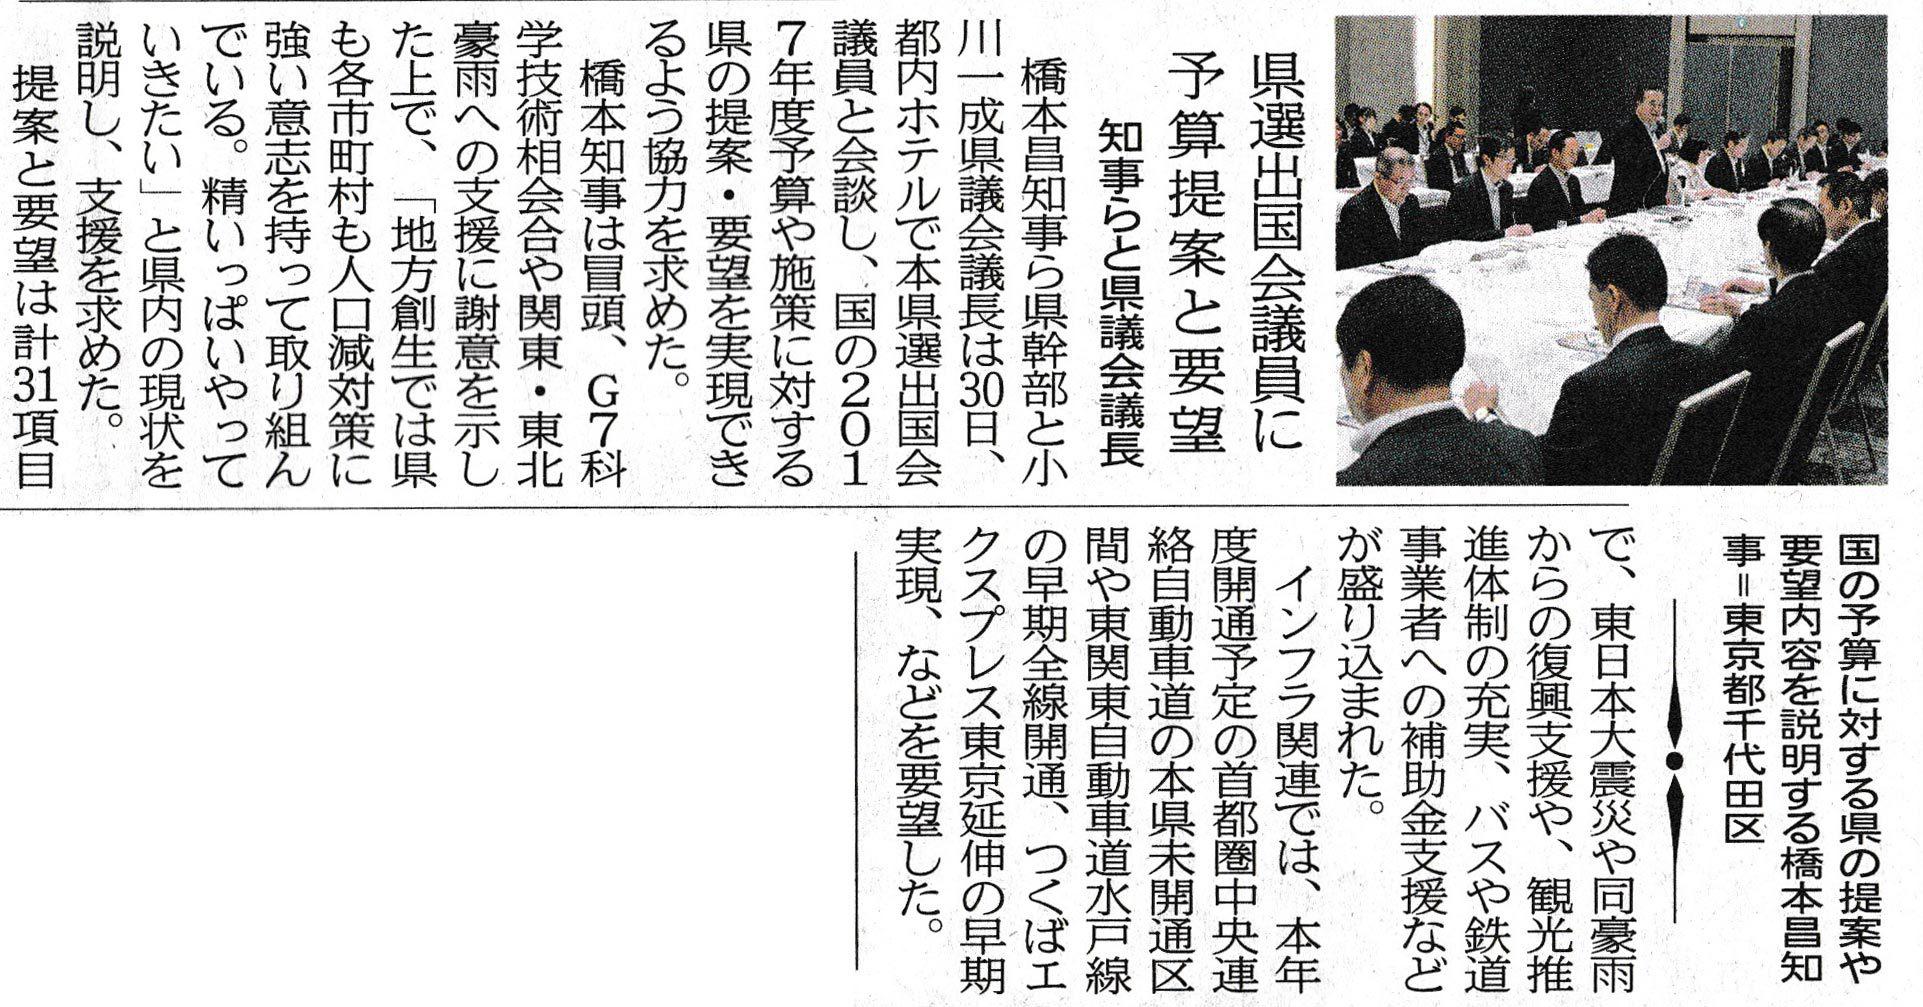 茨城県選出国会議員に予算提案と要望